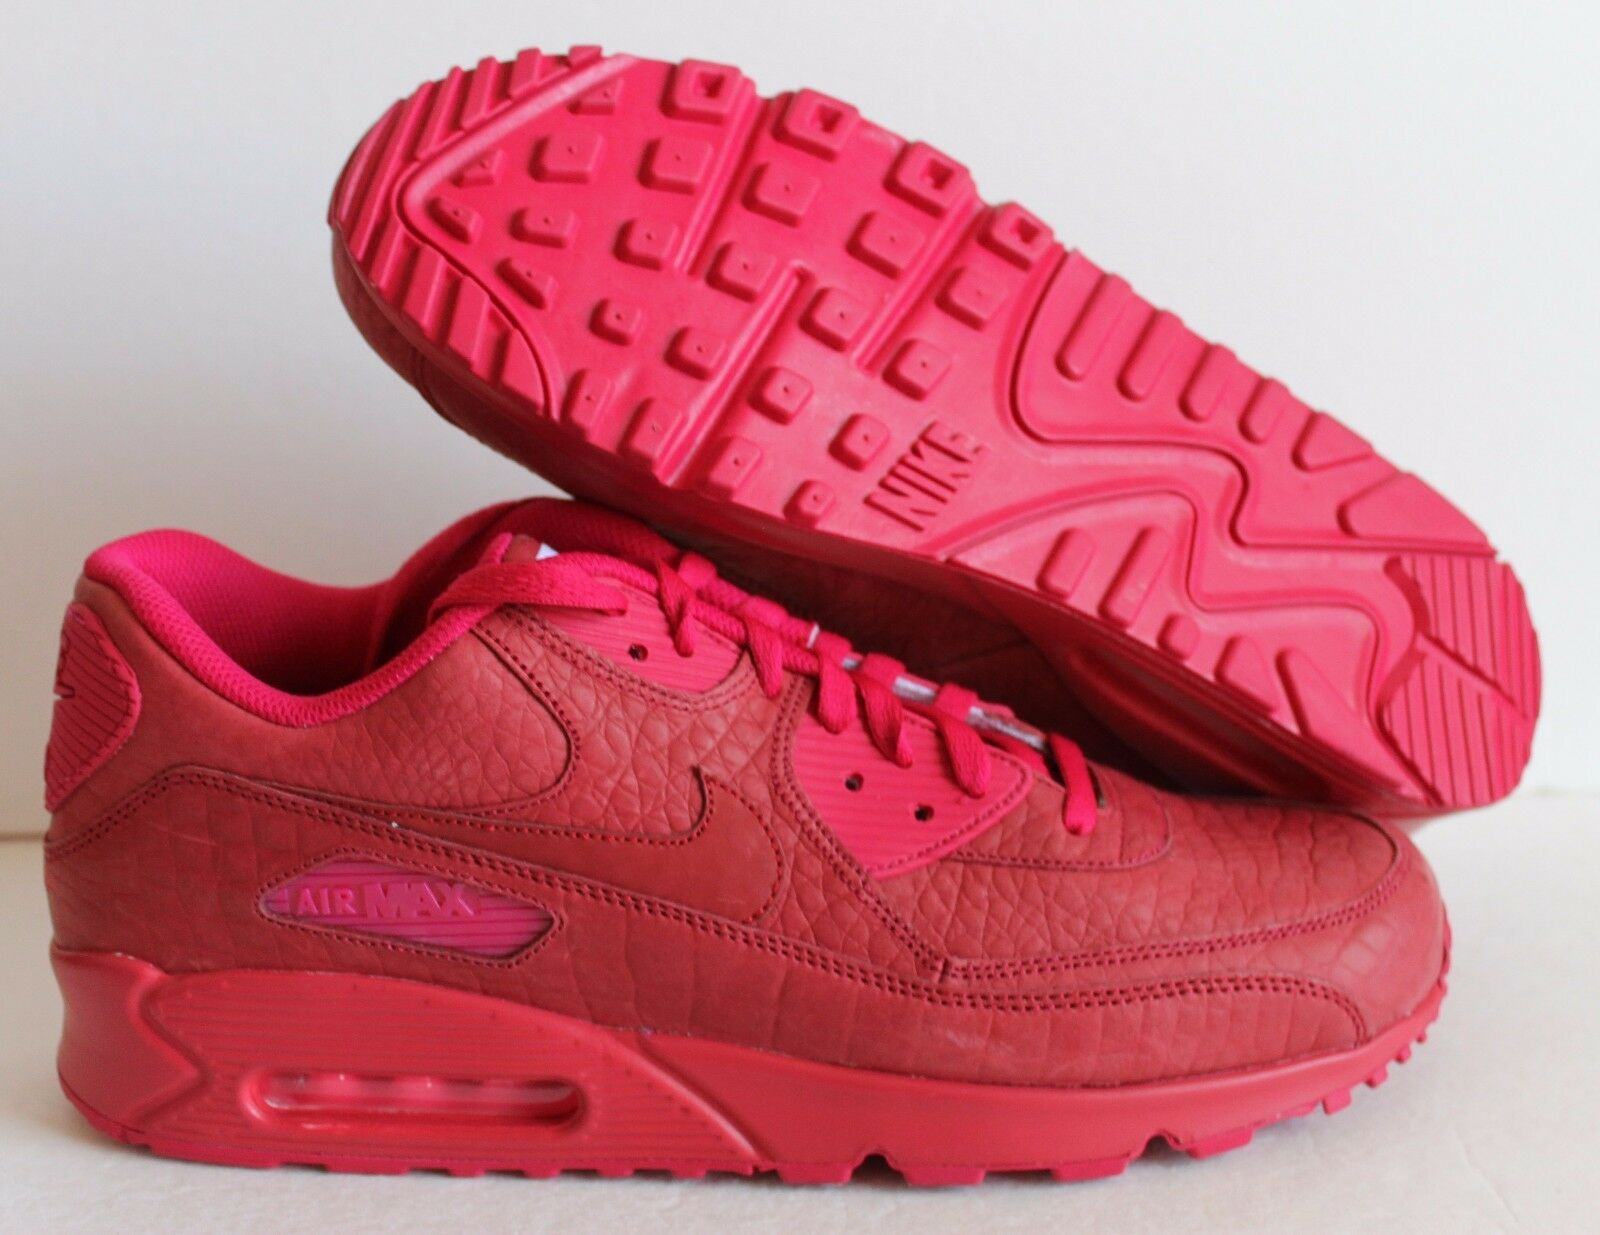 Nike air max 90 uomini coccodrillo premio stampa id red-pink sz 13 [708279-991]